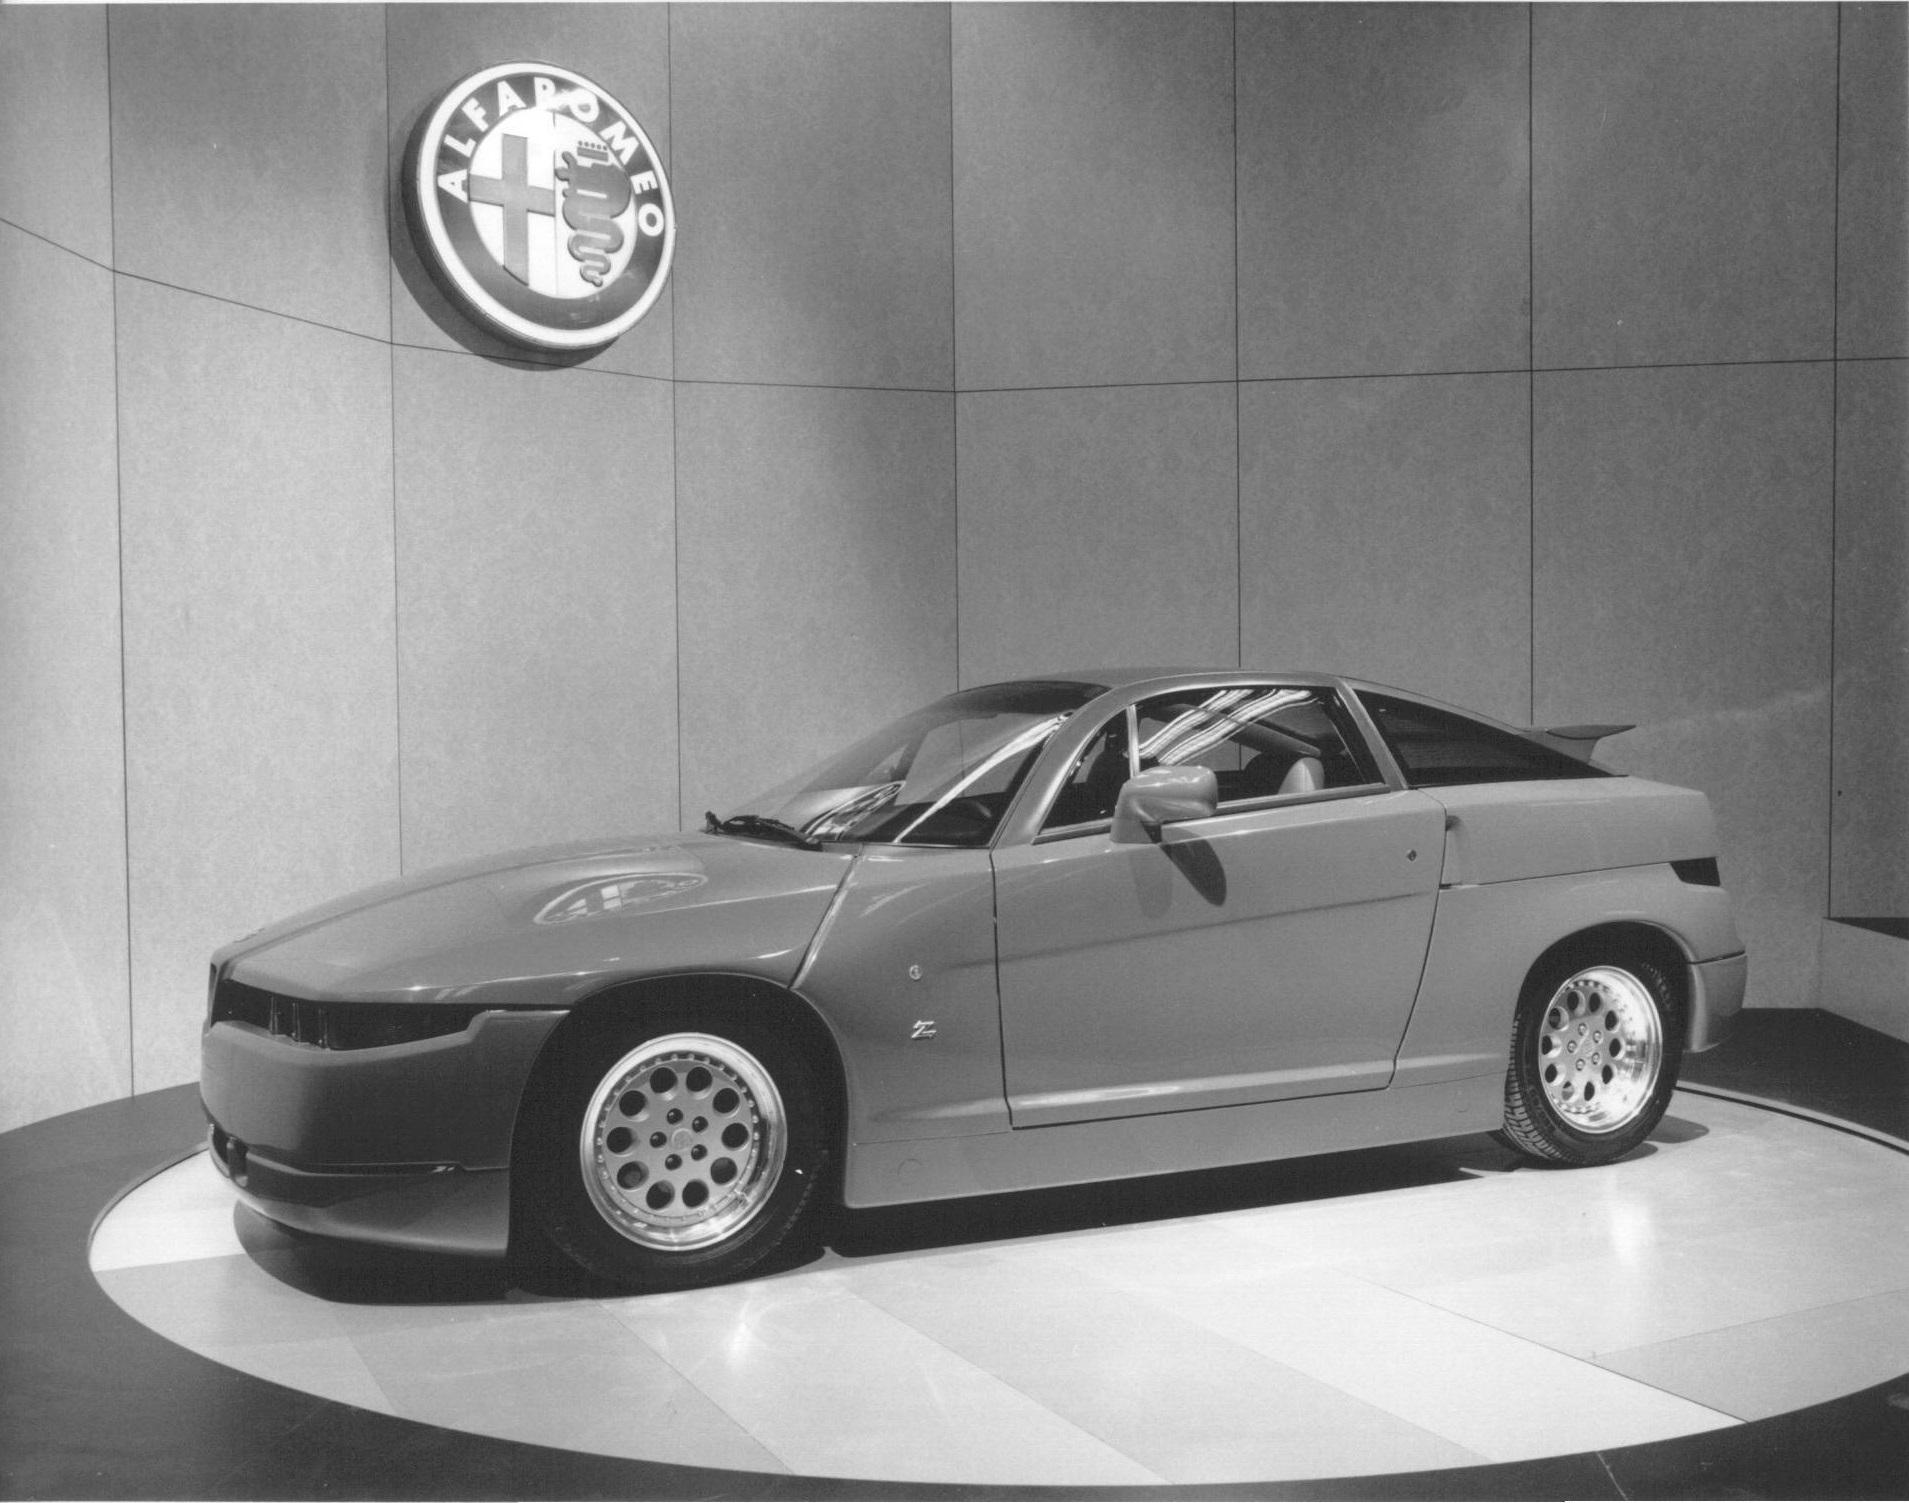 1989_Zagato_Alfa-Romeo_ES-30_01